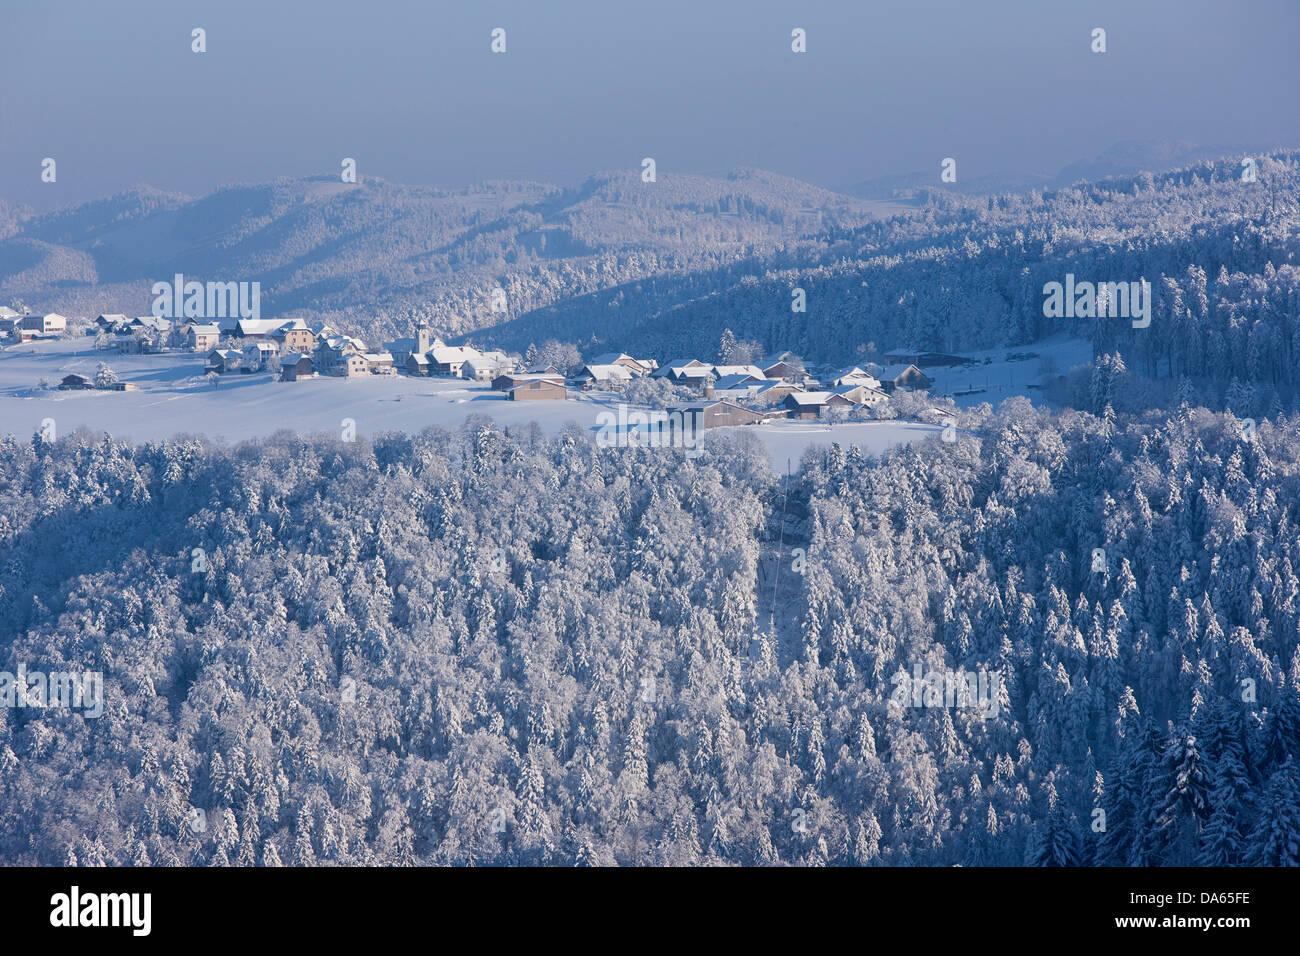 Winter mood, to free mountains, wood, forest, winter, snow, canton, JU, Jura, village, Switzerland, Europe, Saulcy - Stock Image